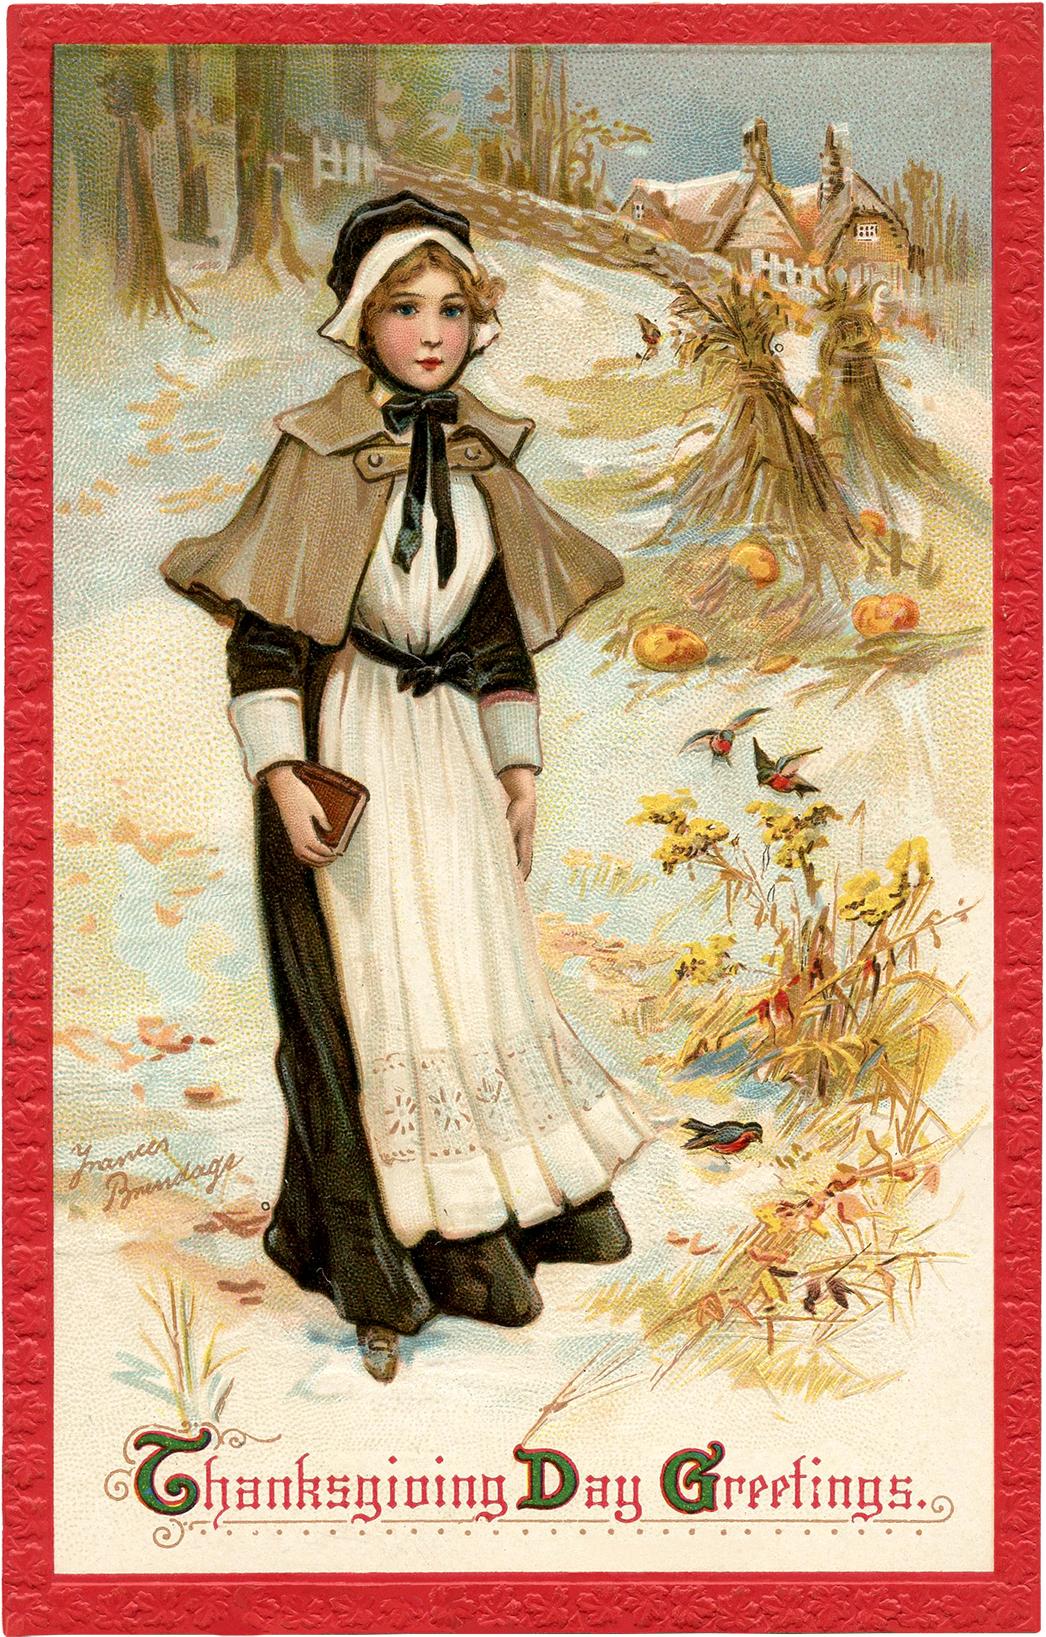 Pretty Thanksgiving Pilgrim Lady Image The Graphics Fairy